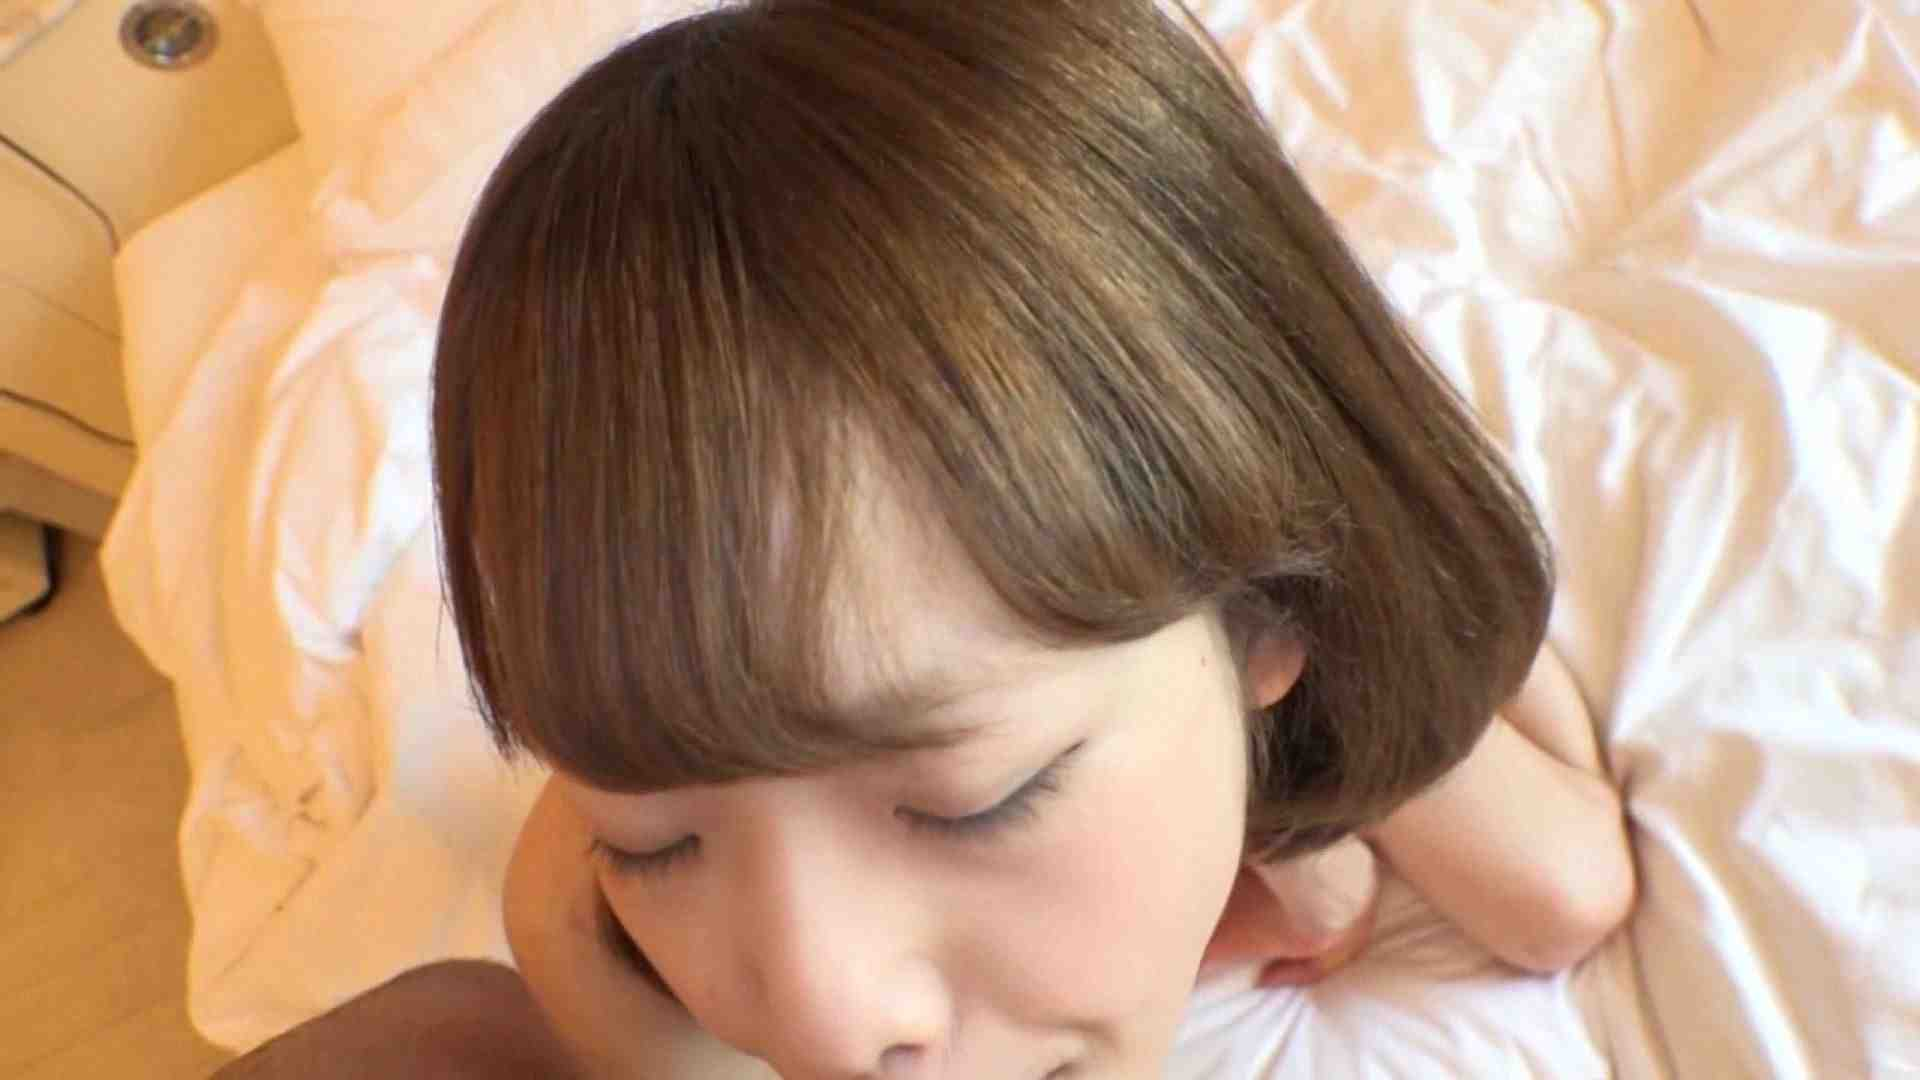 S級厳選美女ビッチガールVol.32 前編 美しいOLの裸体   ロリ  99pic 91